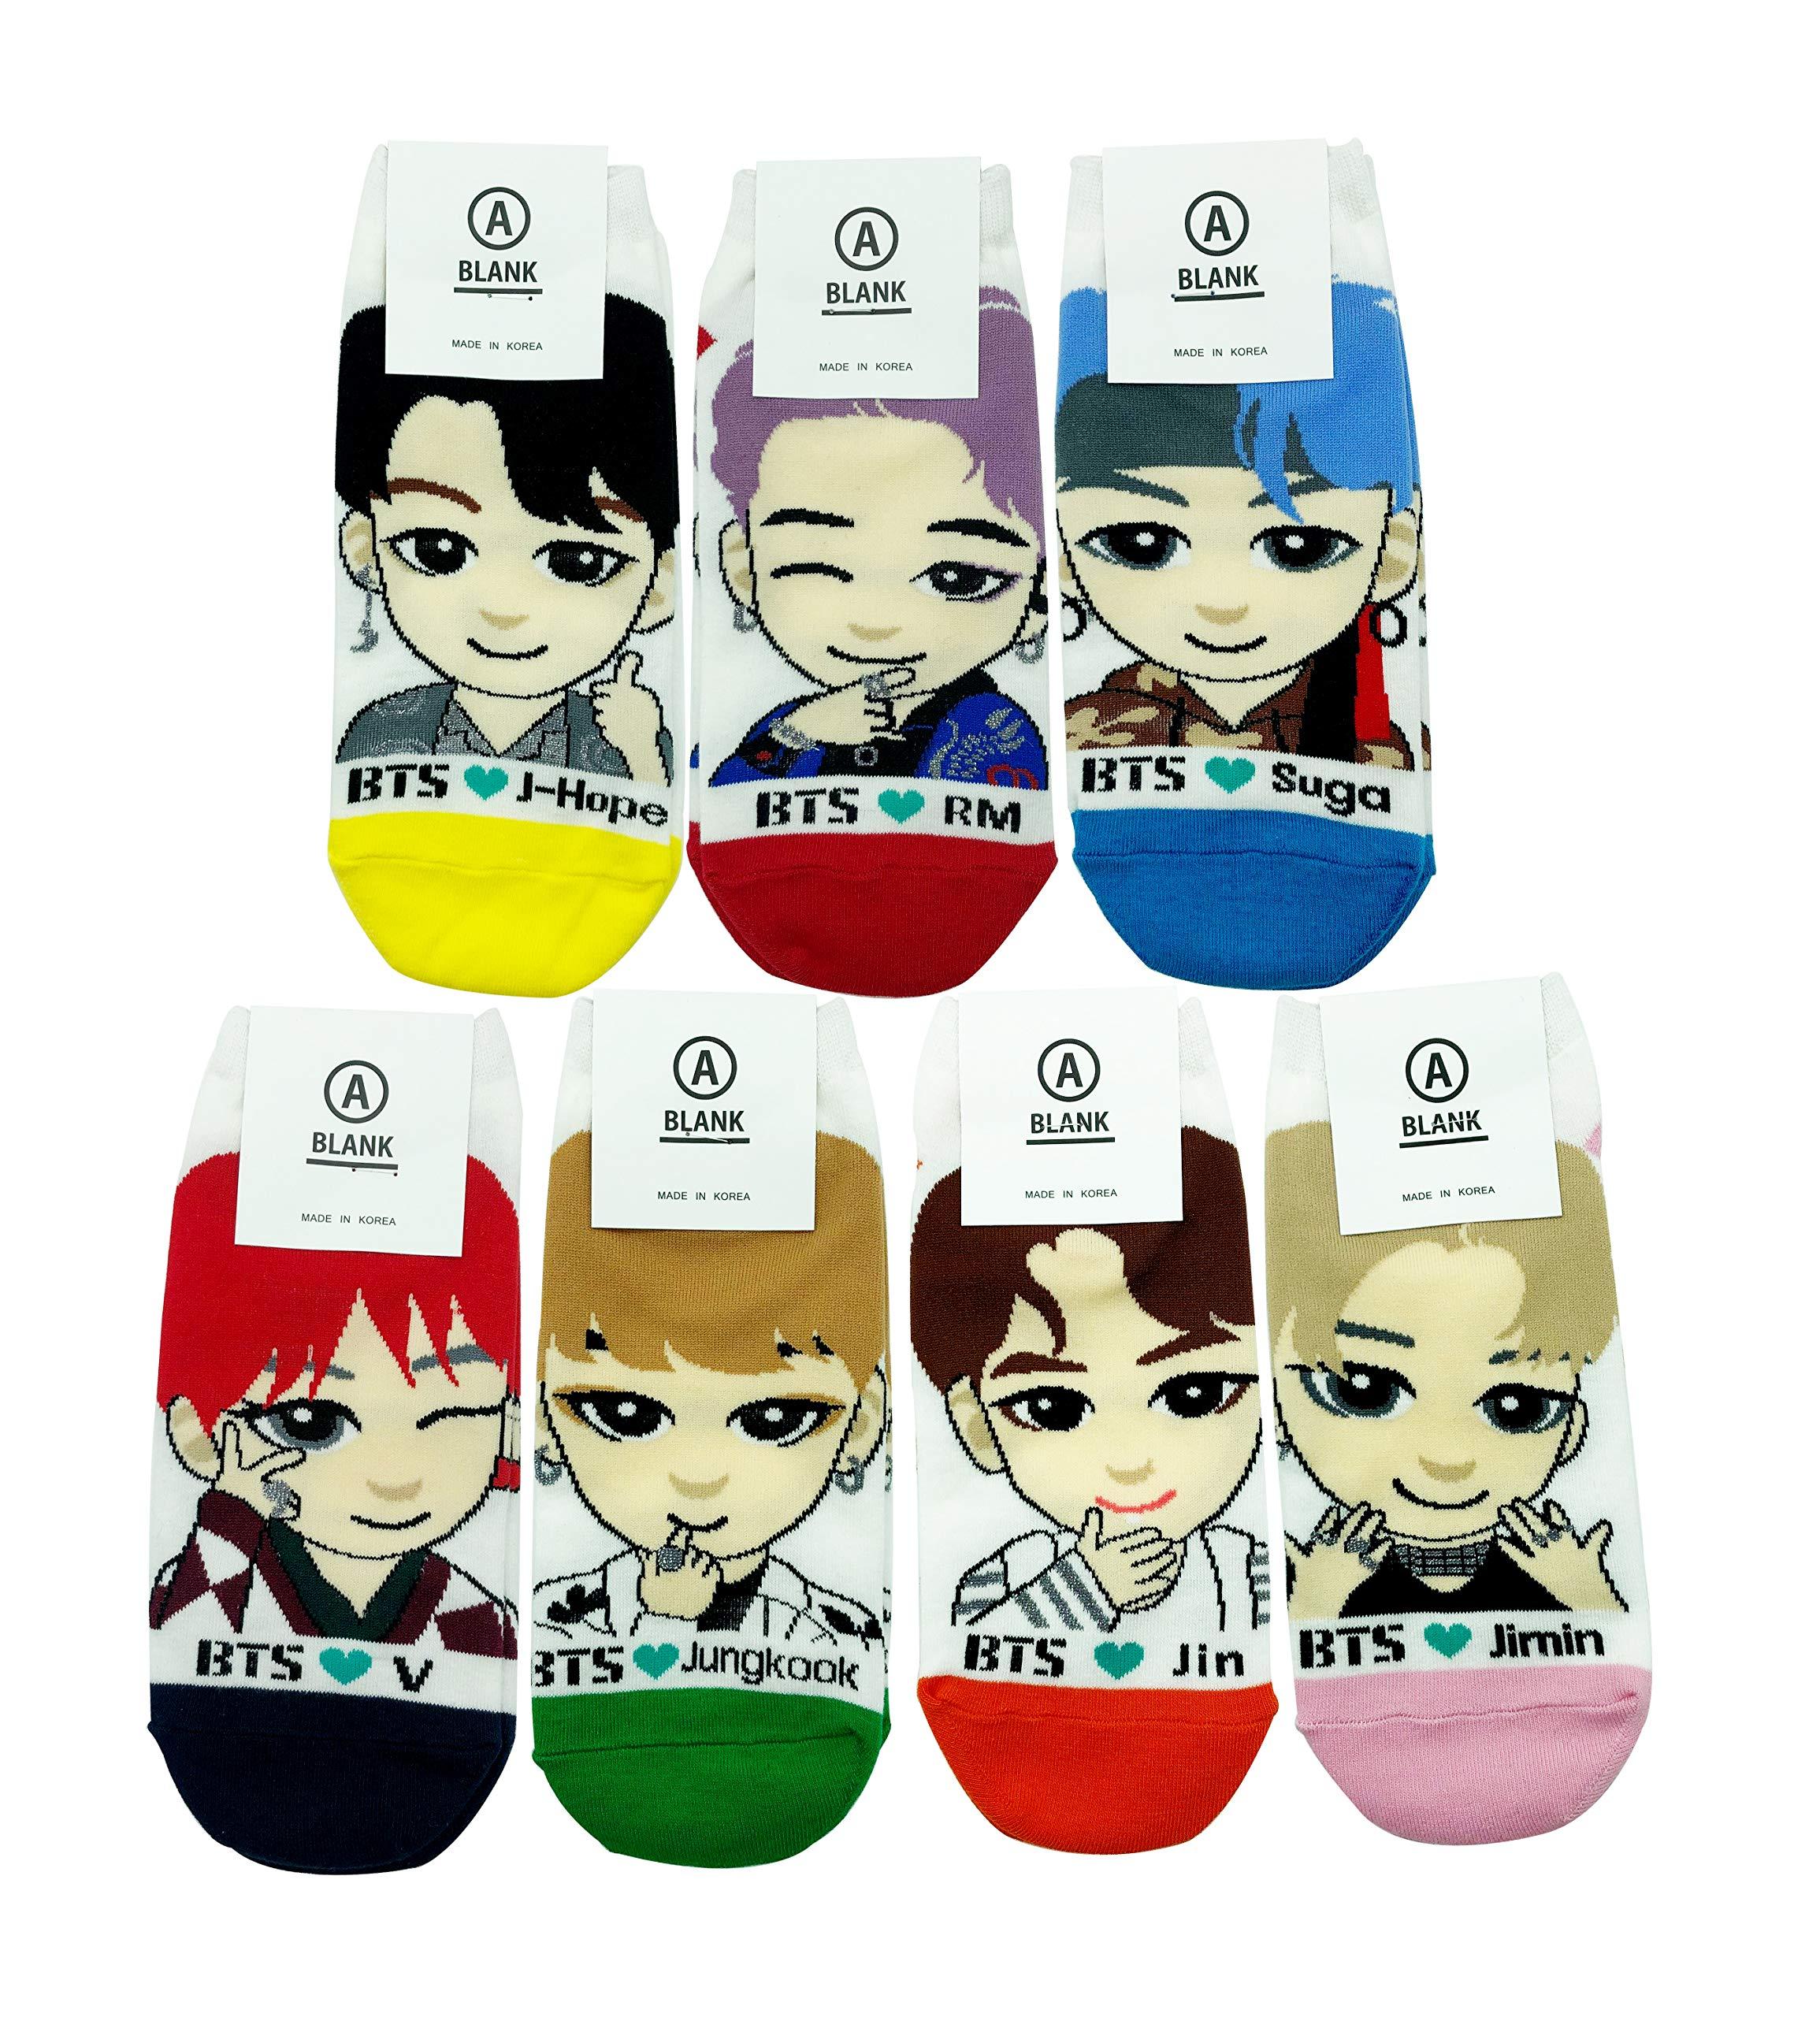 BTS KPOP Character Socks 7 pairs Photocard Included Bangtan Jimin